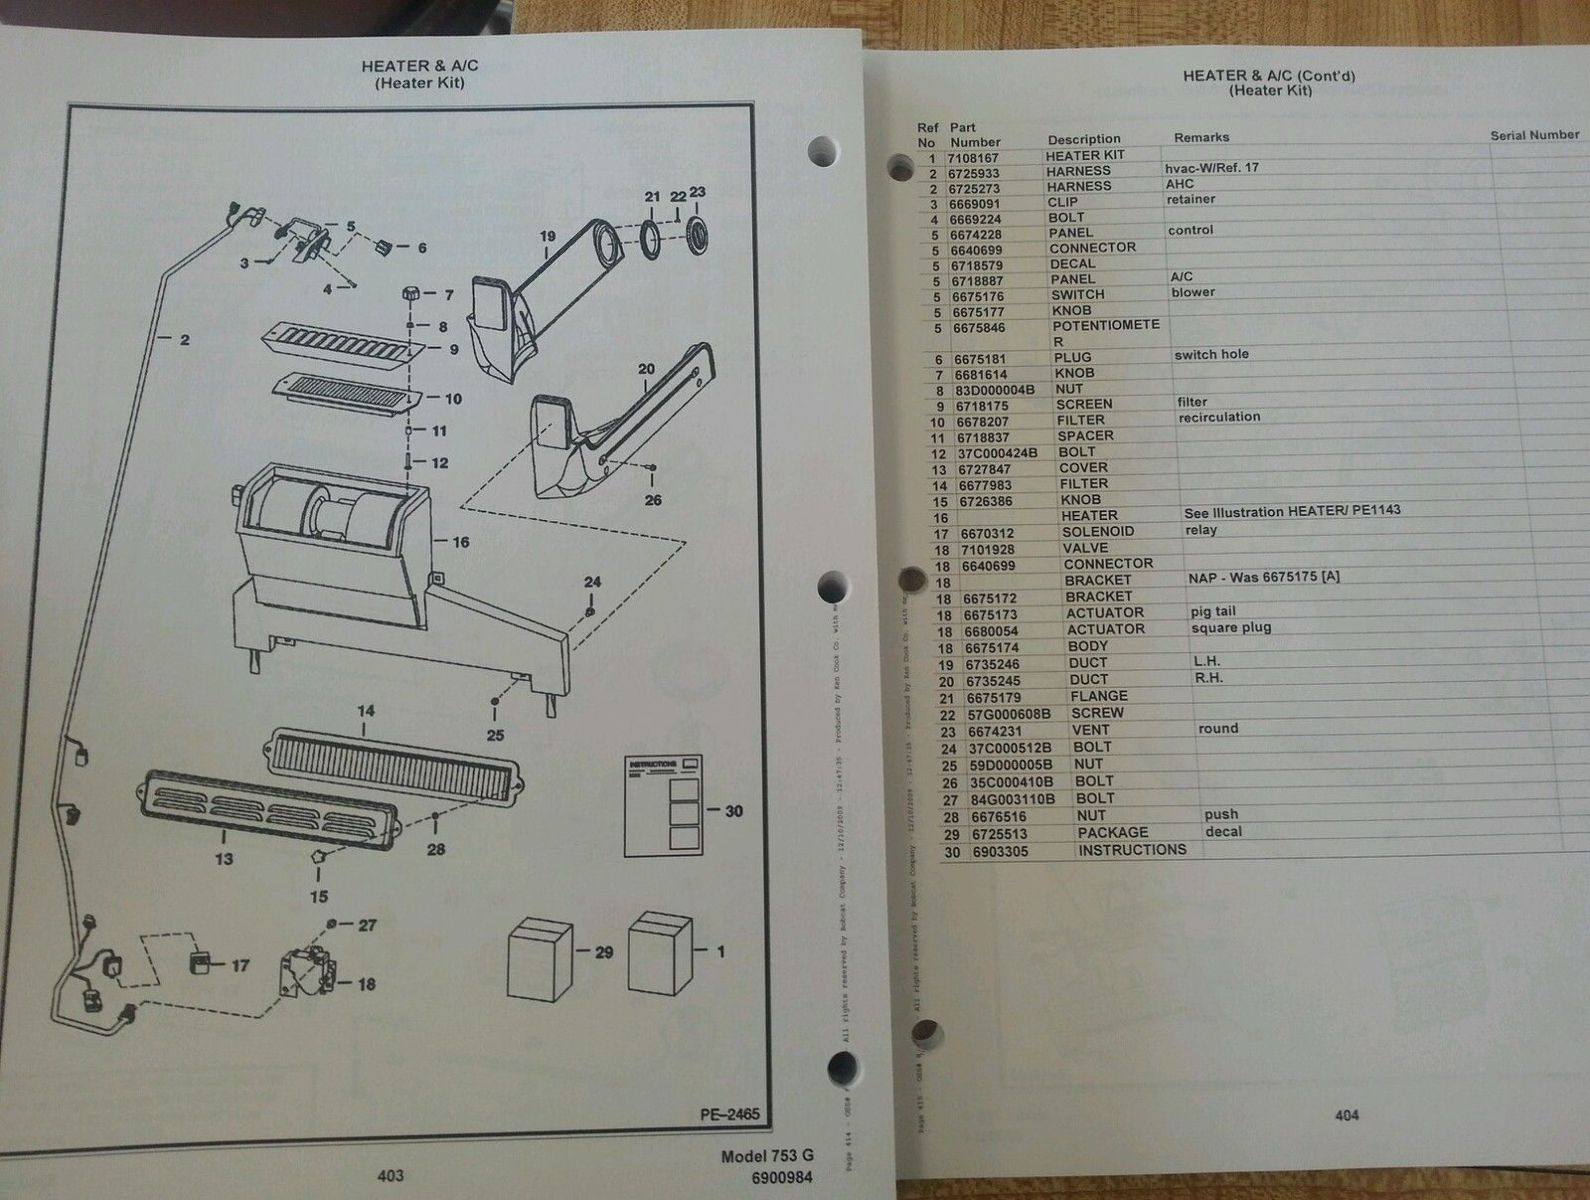 sd423451993 bobcat 753 753g skid steer parts manual book 6900984 8 bobcat 753 753g skid steer parts manual book 6900984 finney